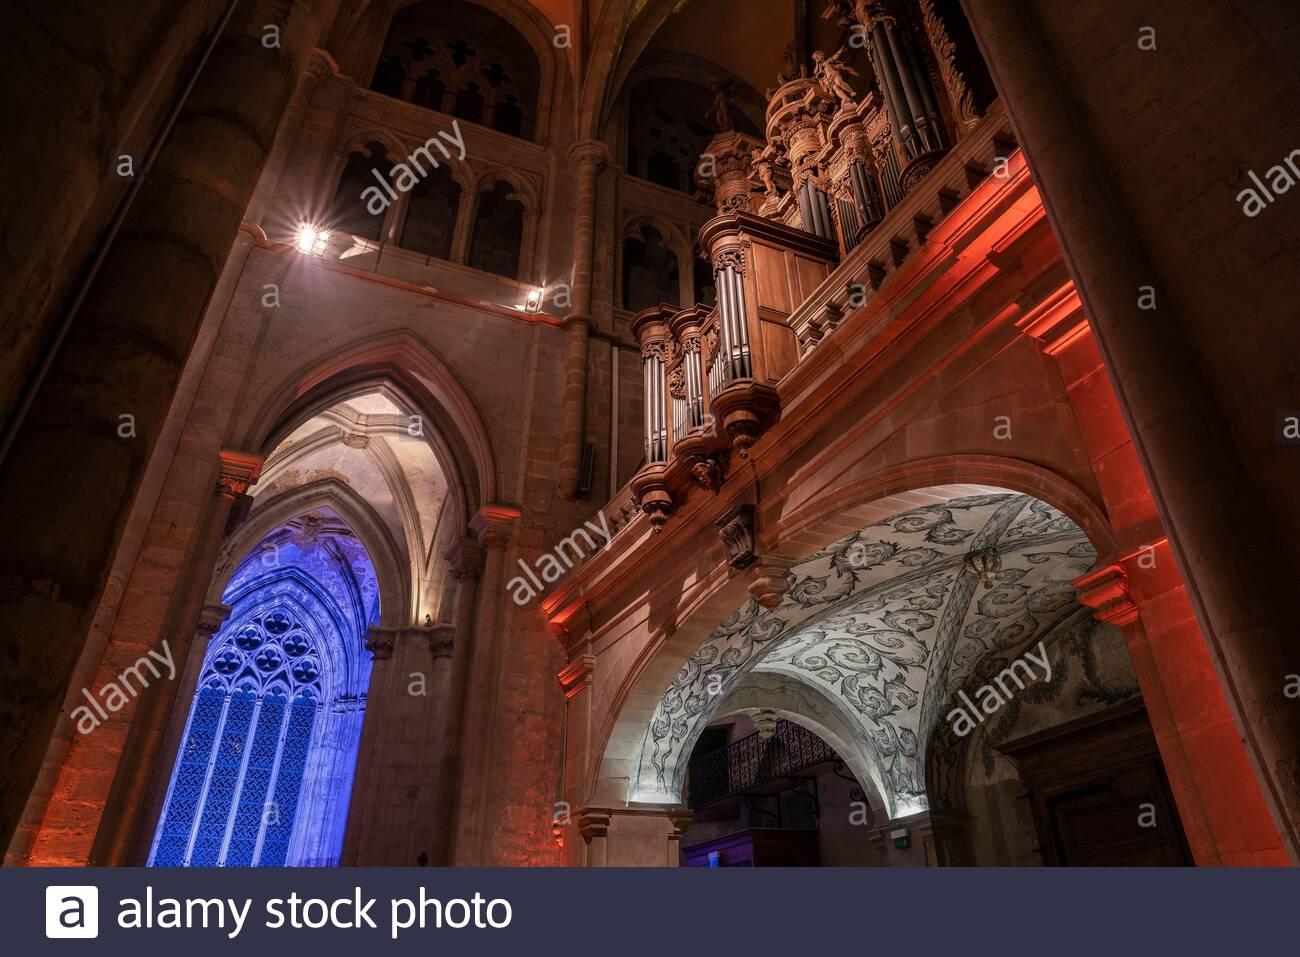 Saint-Antoine-l'Abbaye : interior of the Abbey church Stock Photo